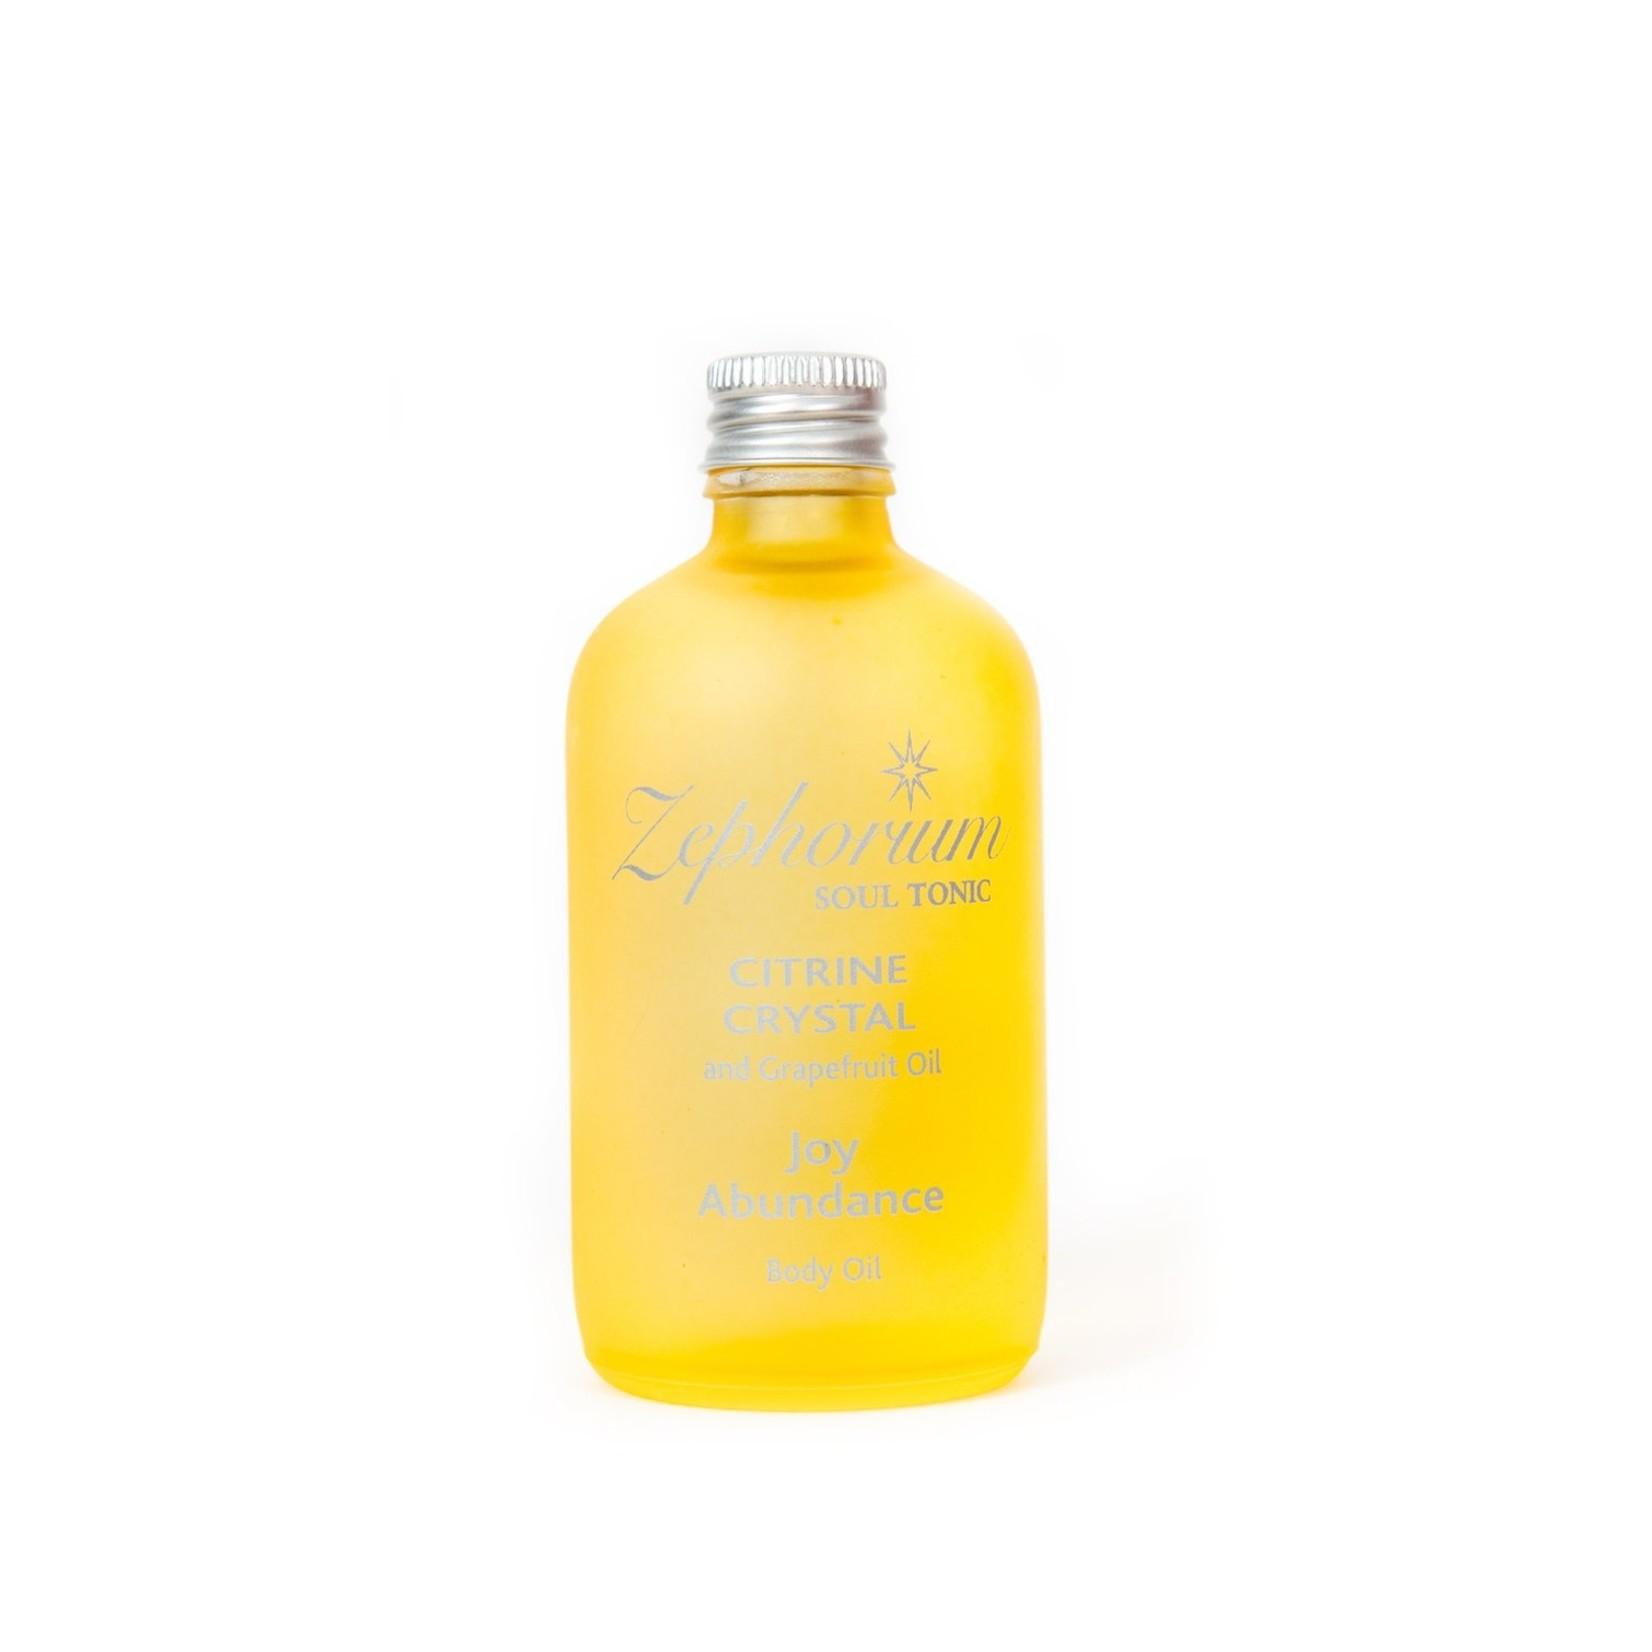 Zephorium Citrine body oil Zephorium - solar plexus chakra